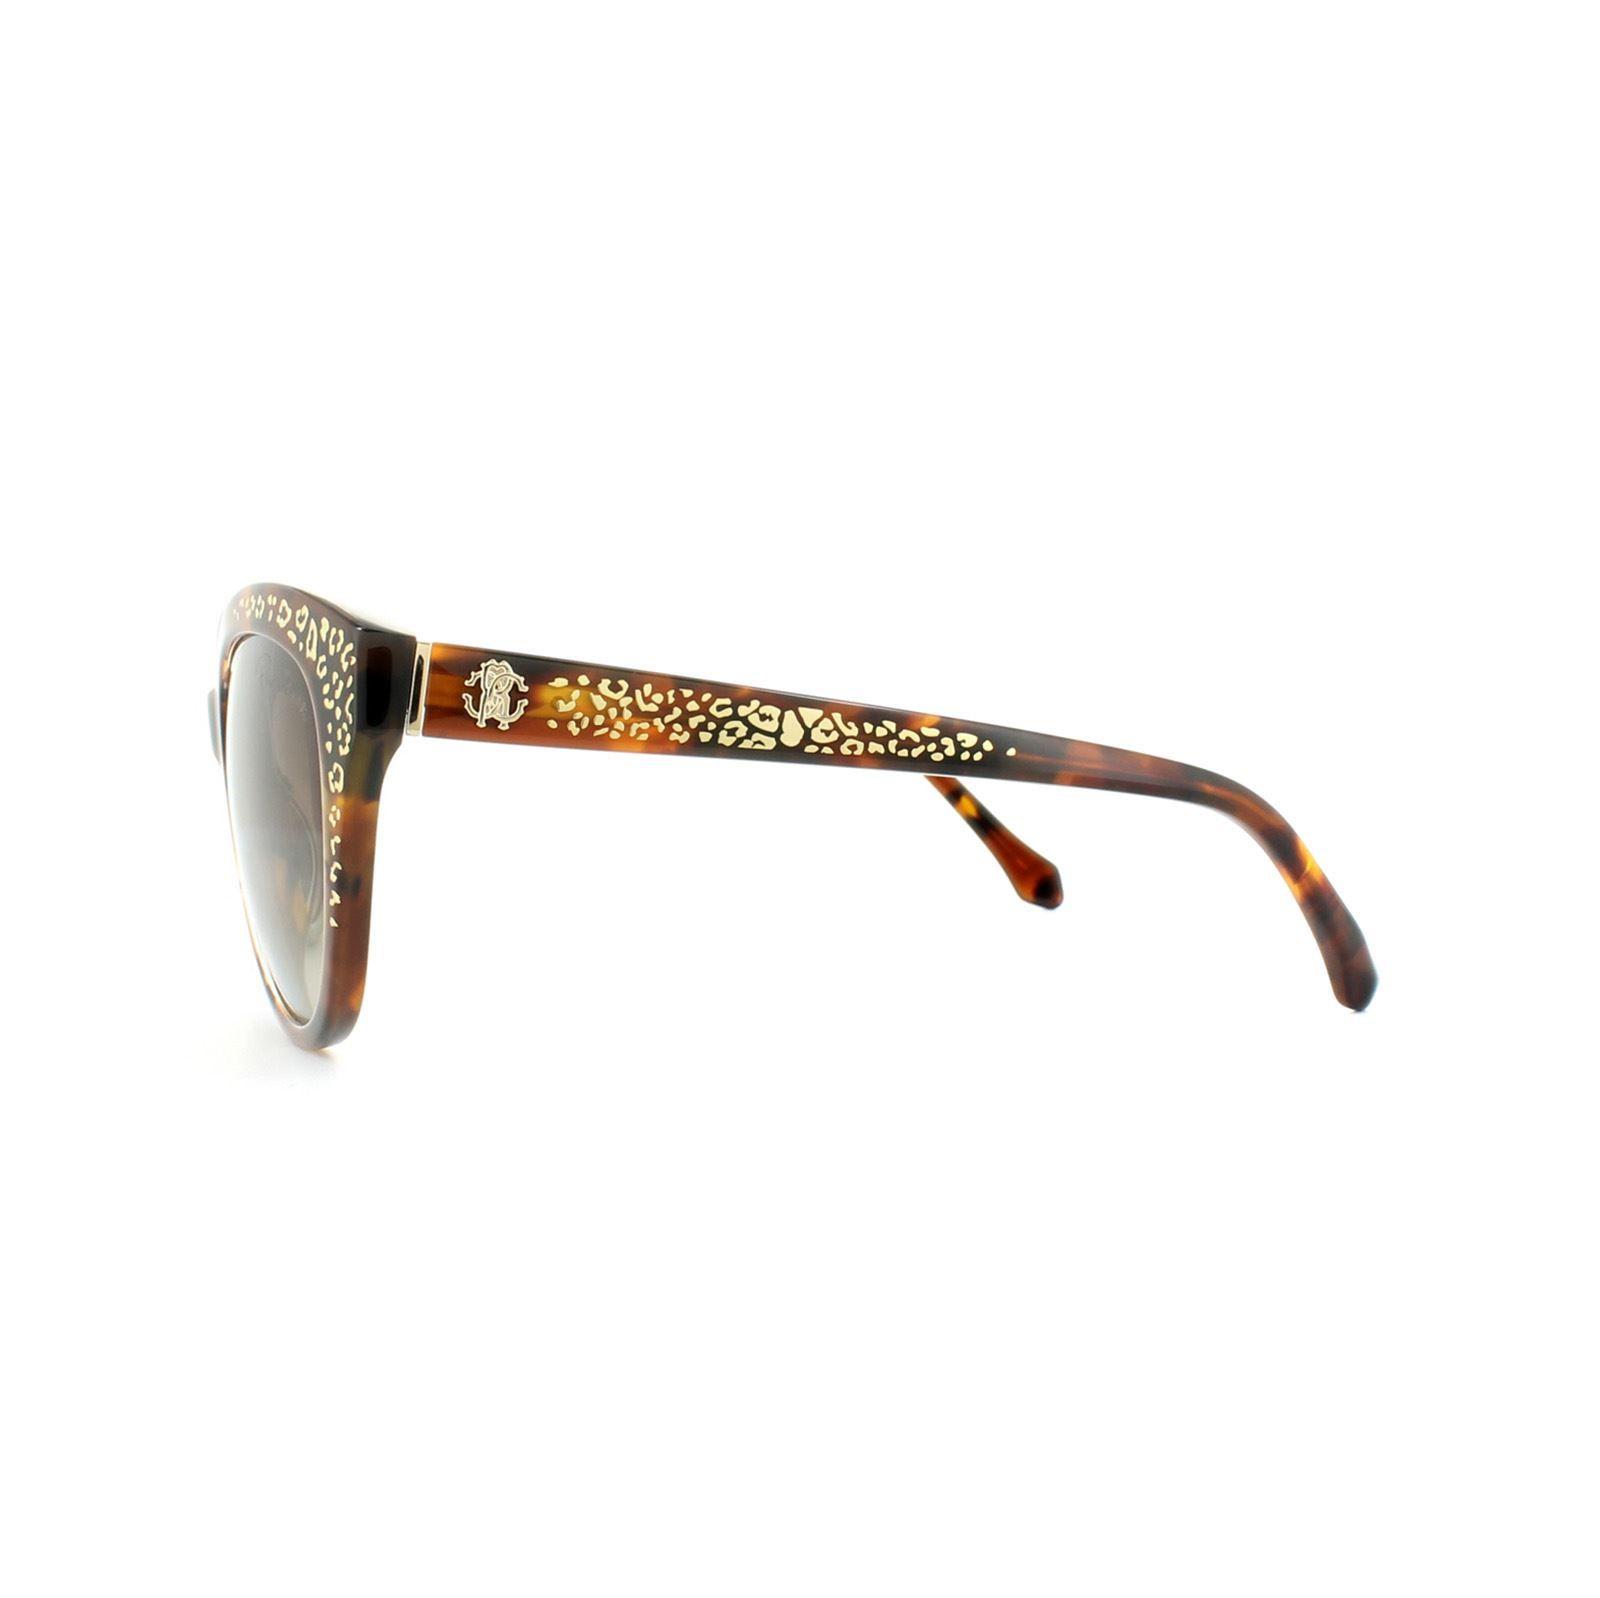 Roberto Cavalli Sunglasses Tseang RC992S 52G Dark Havana Gold Print Brown Mirror